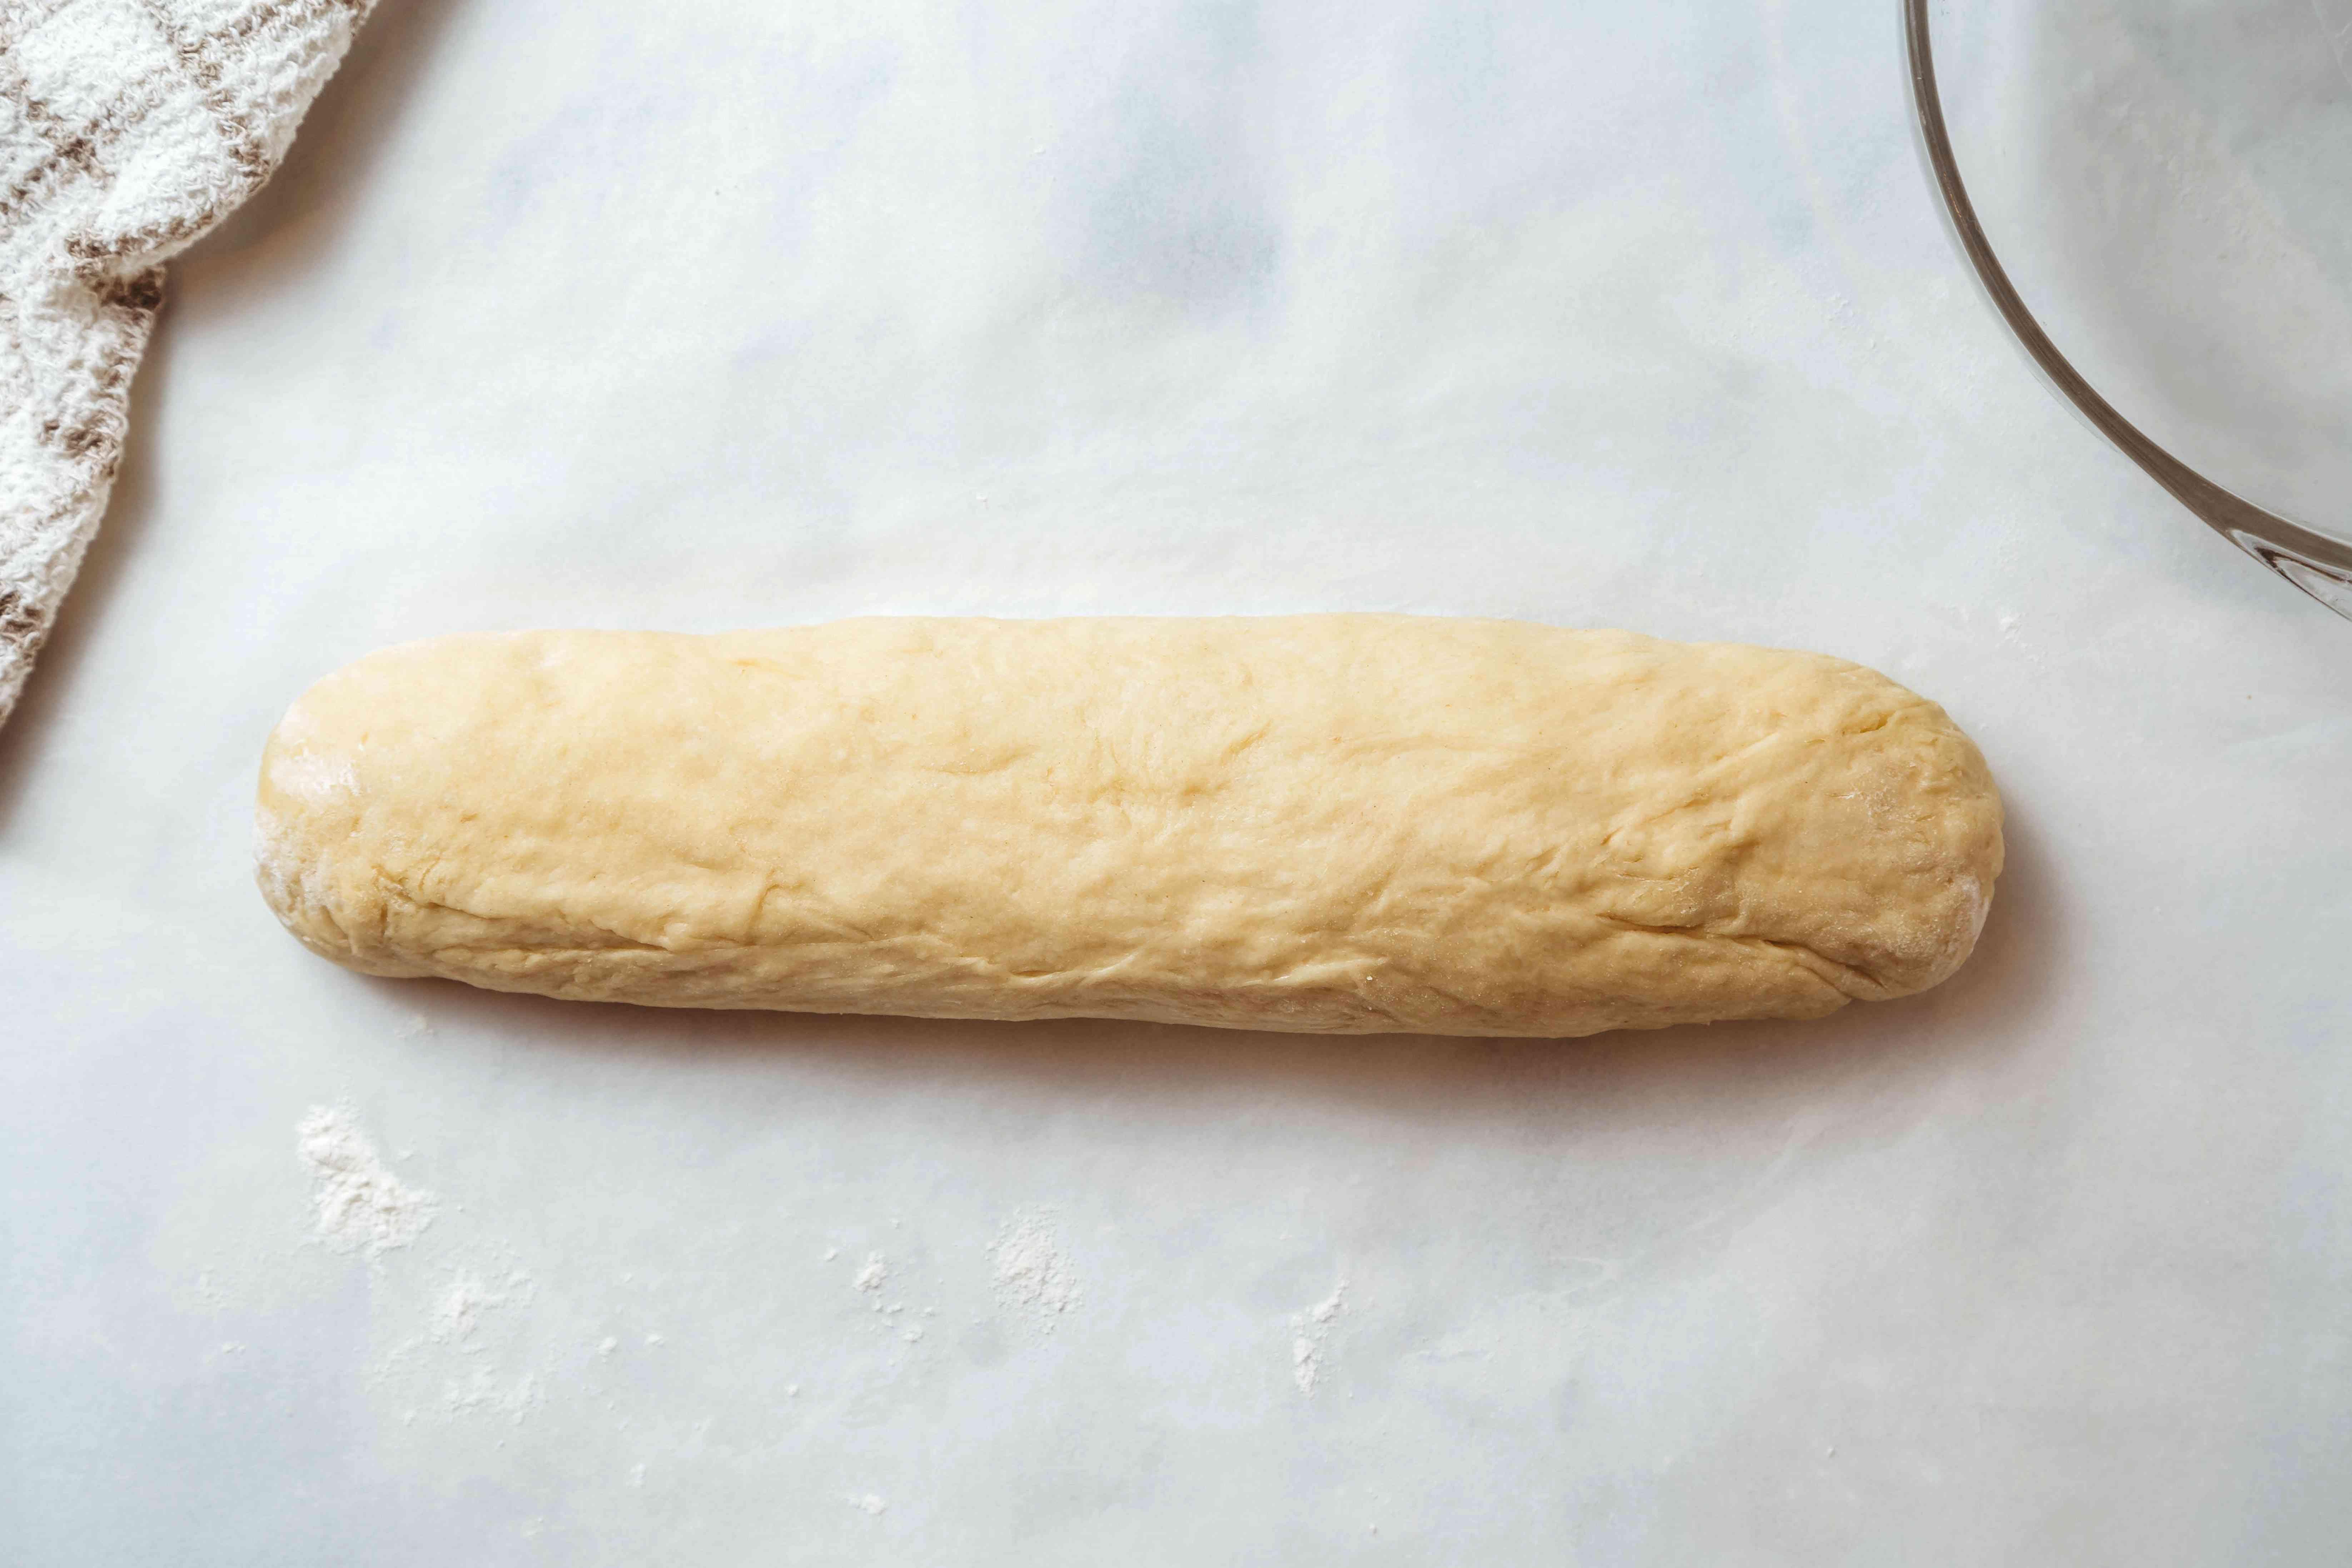 dough shaped into a log